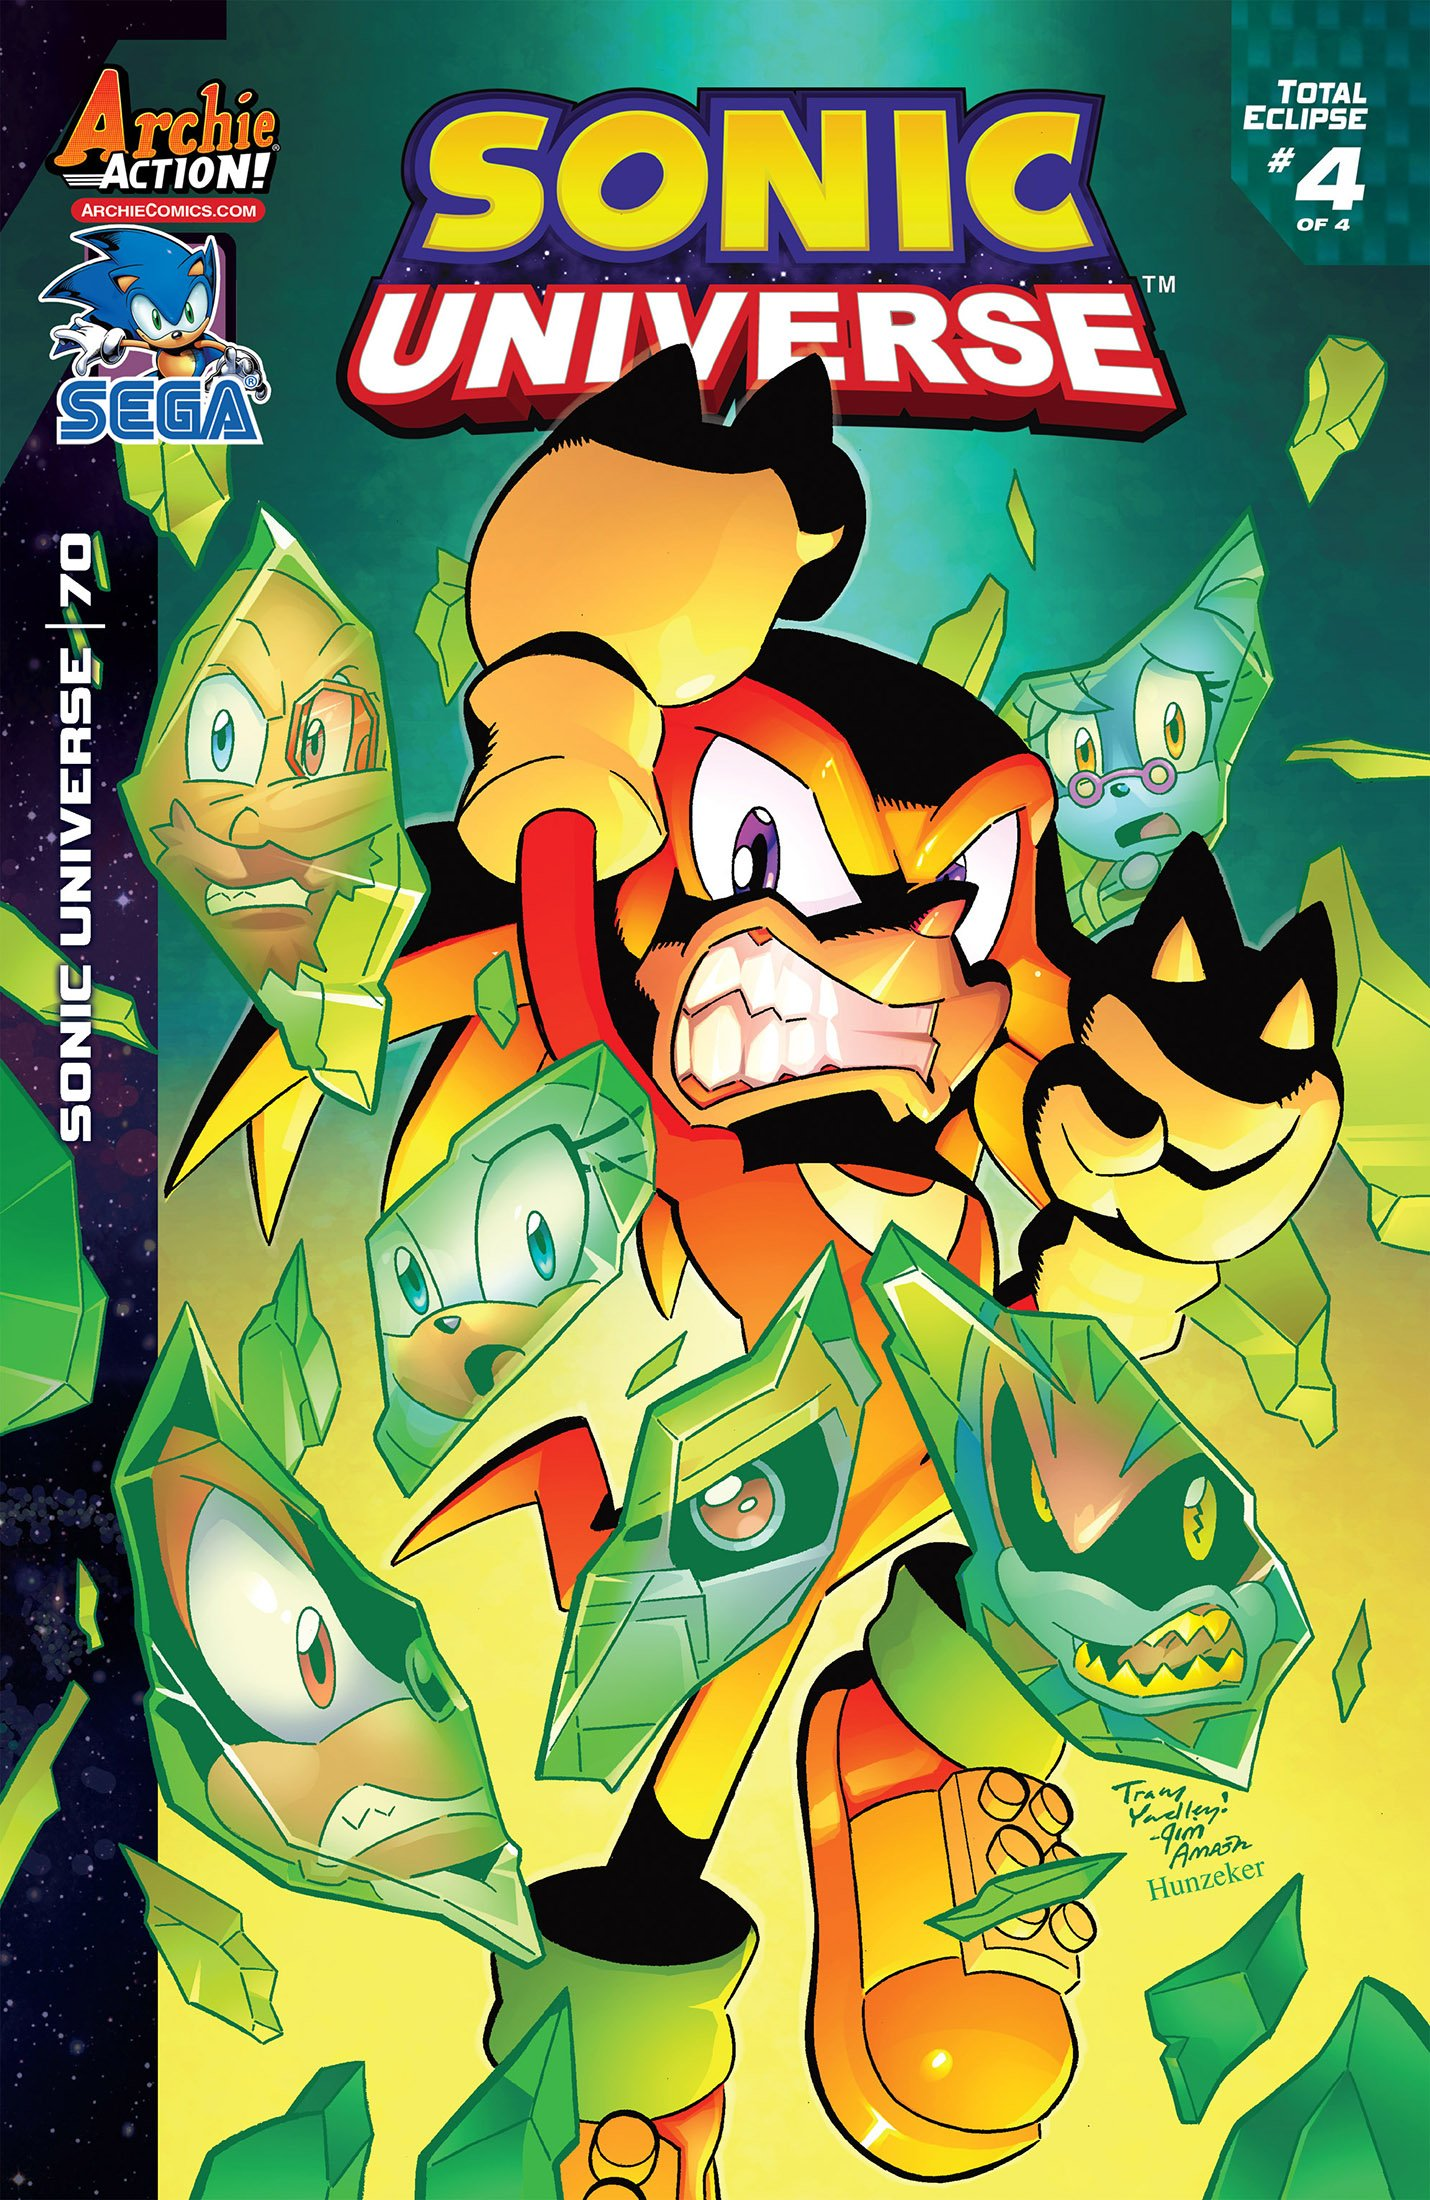 Sonic Universe 070 (January 2015)